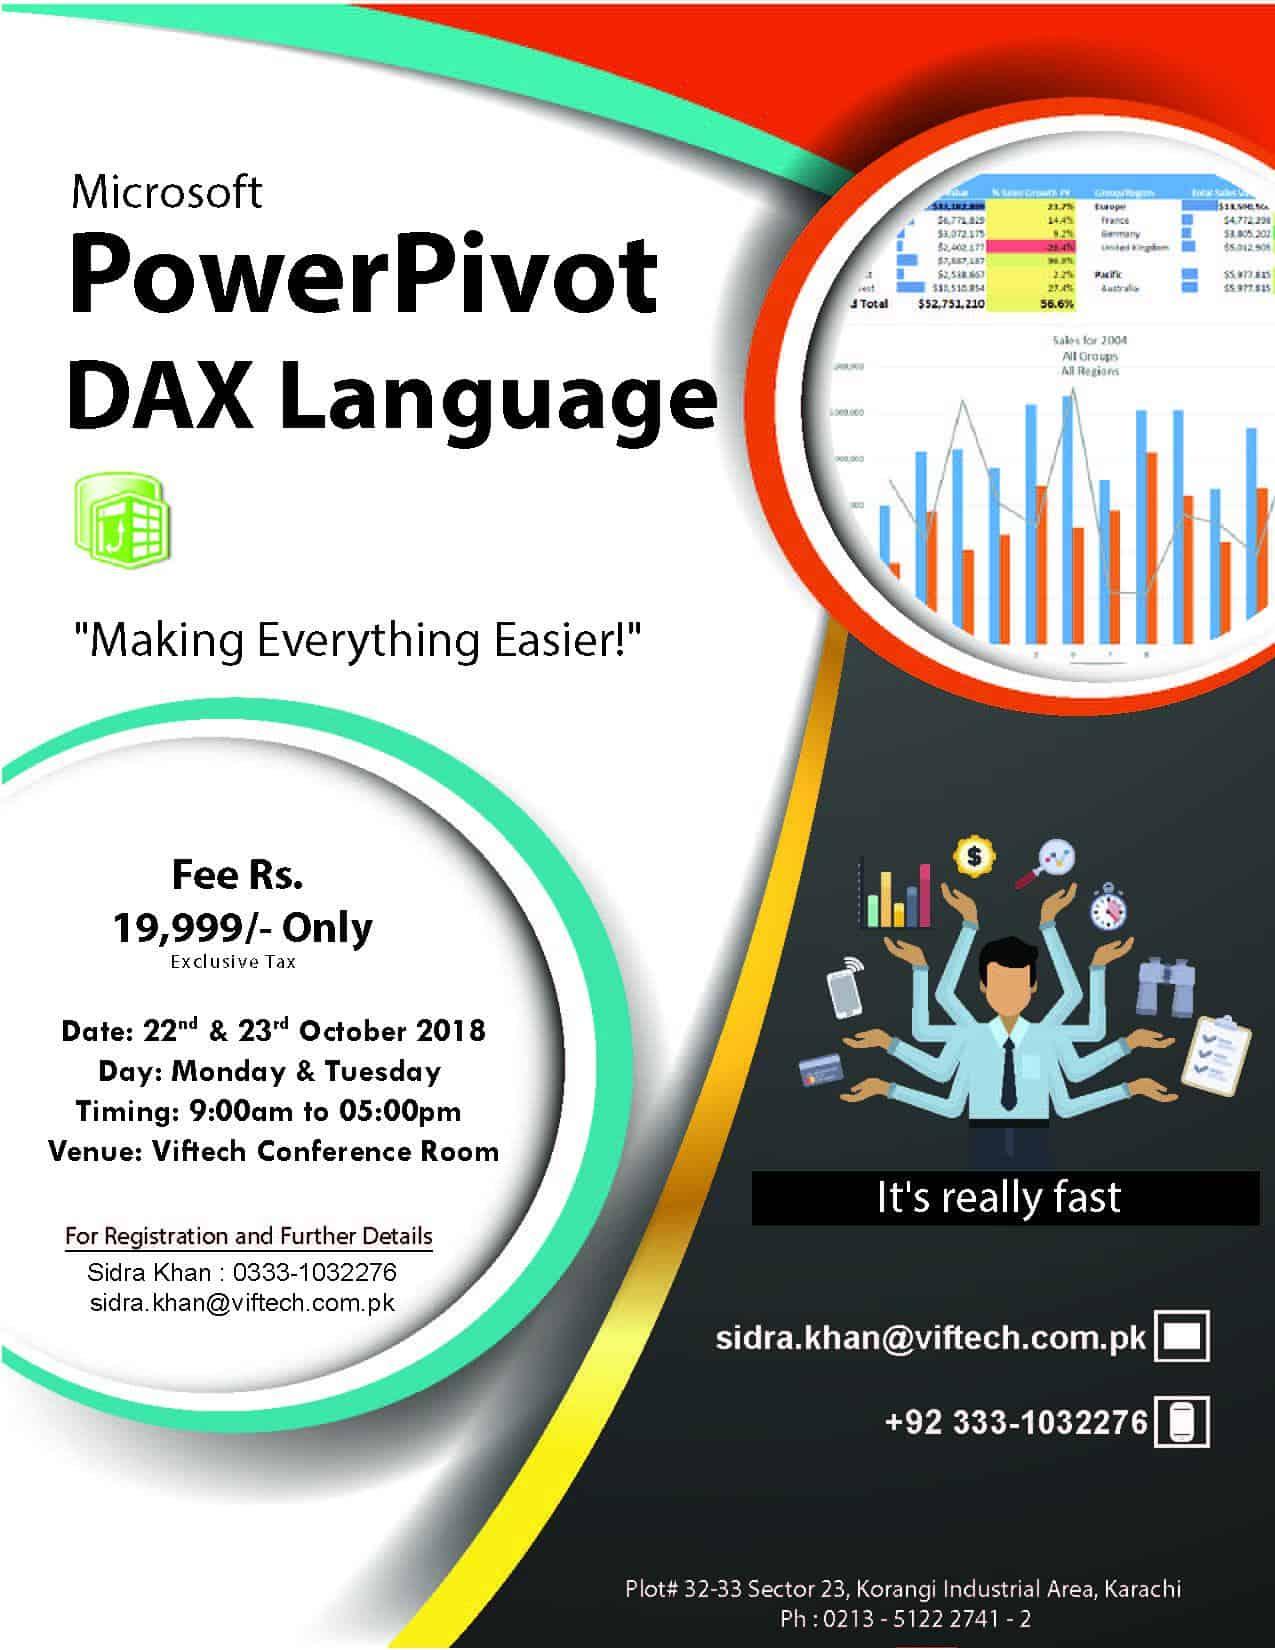 DAX Language Training